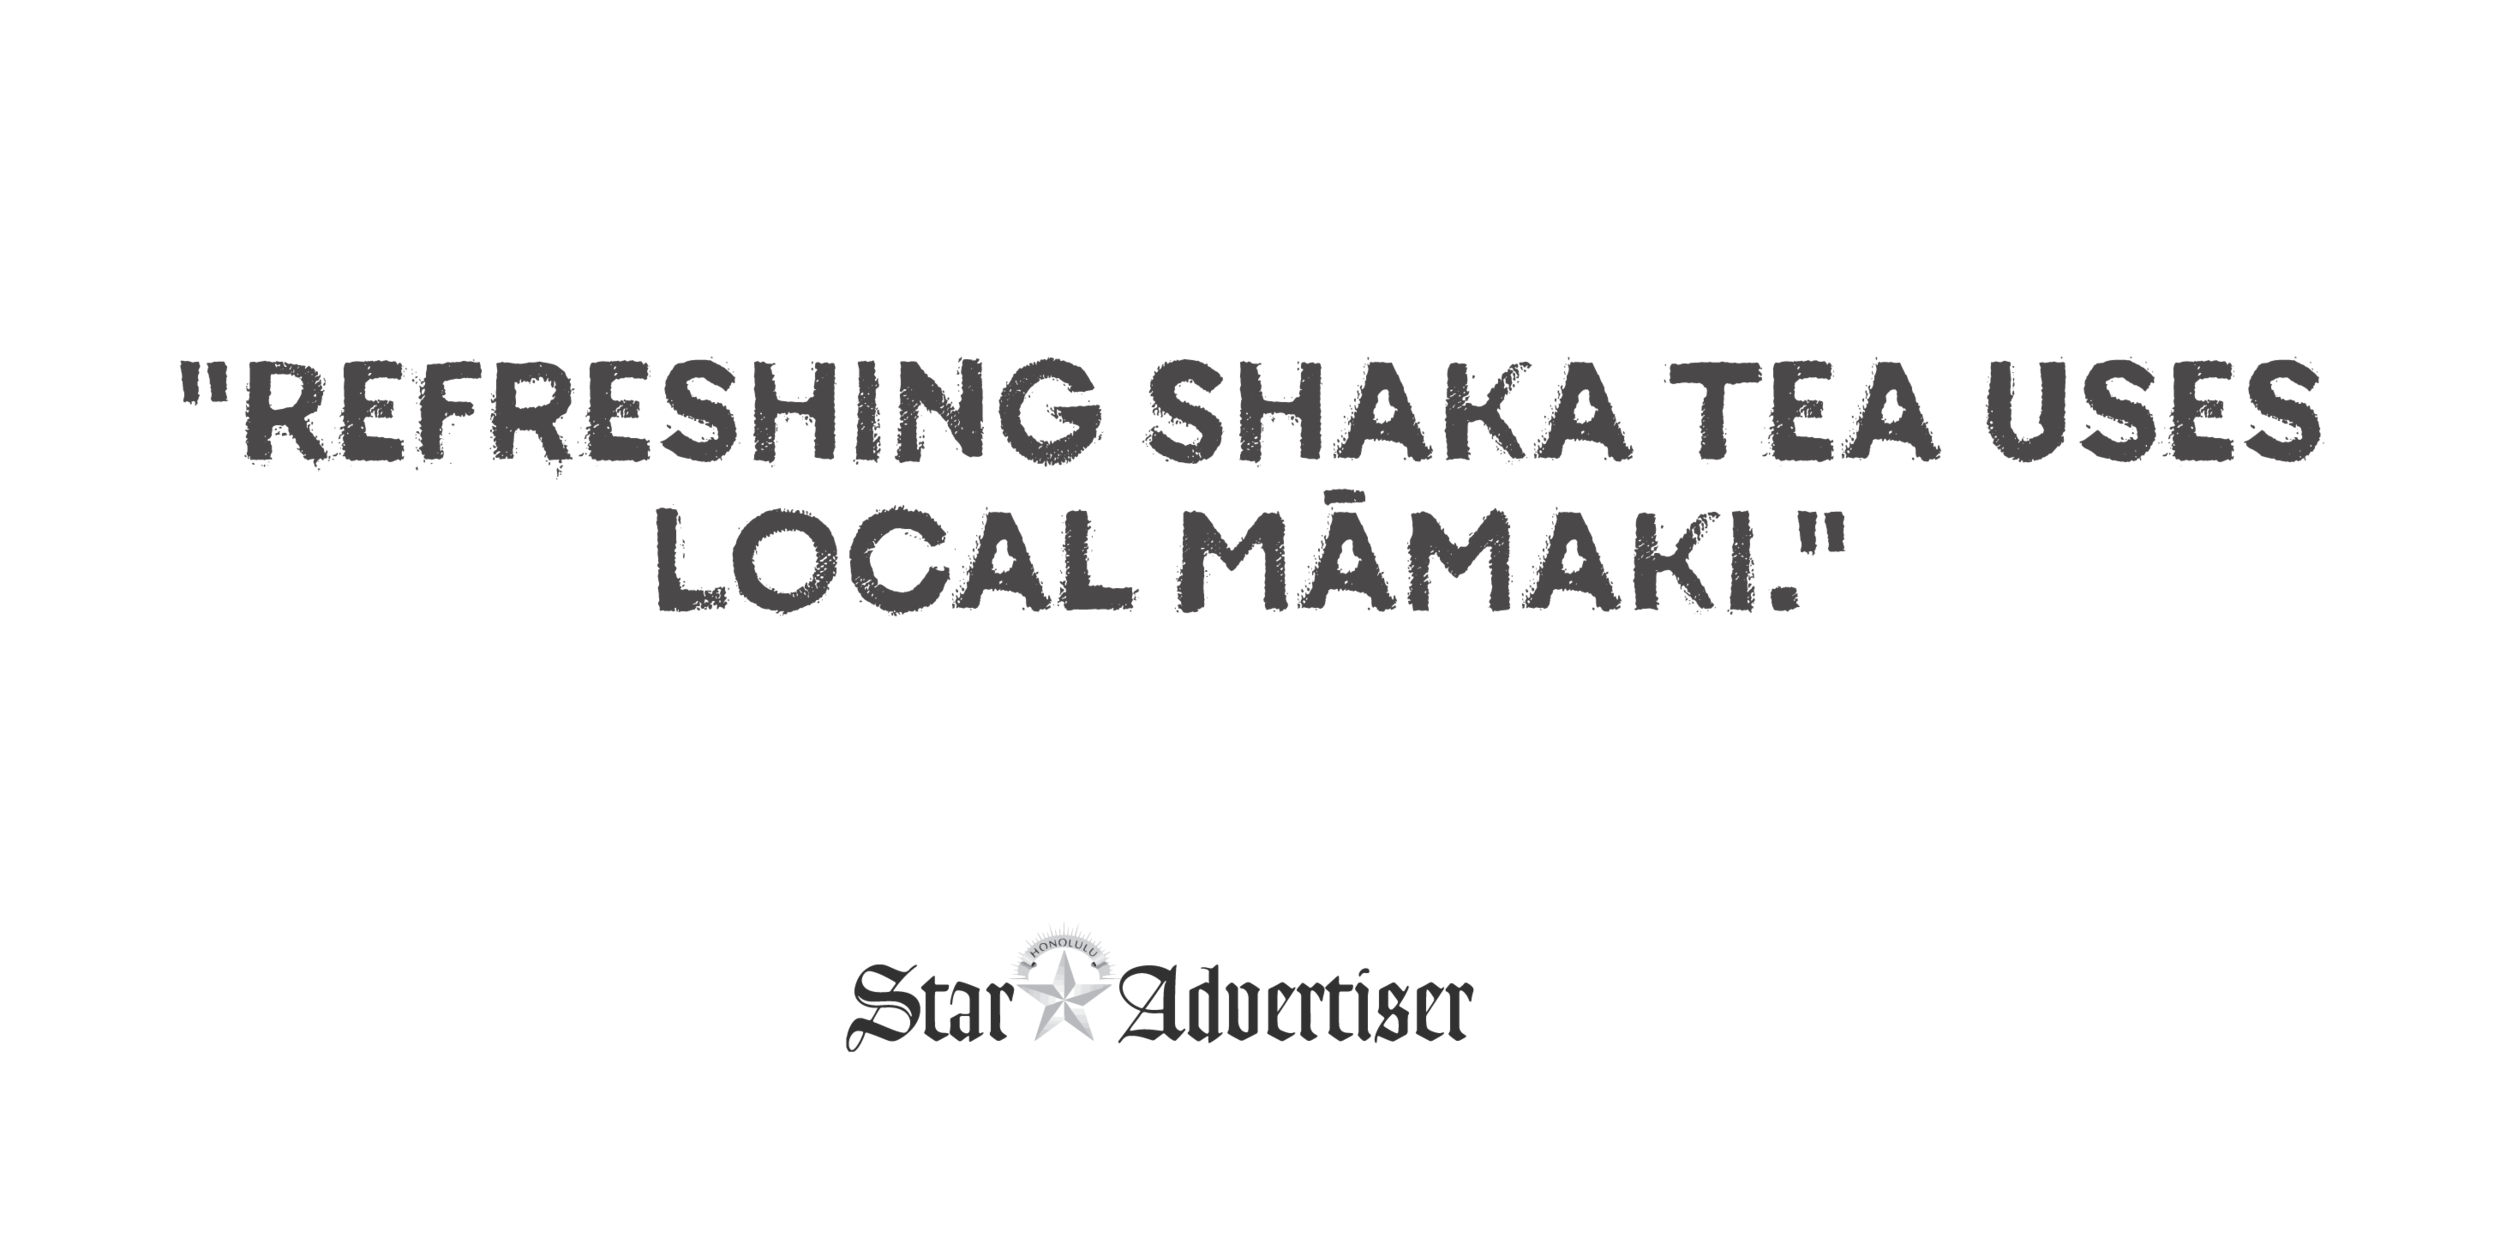 ShakaTea_Press_Quotes-05.png